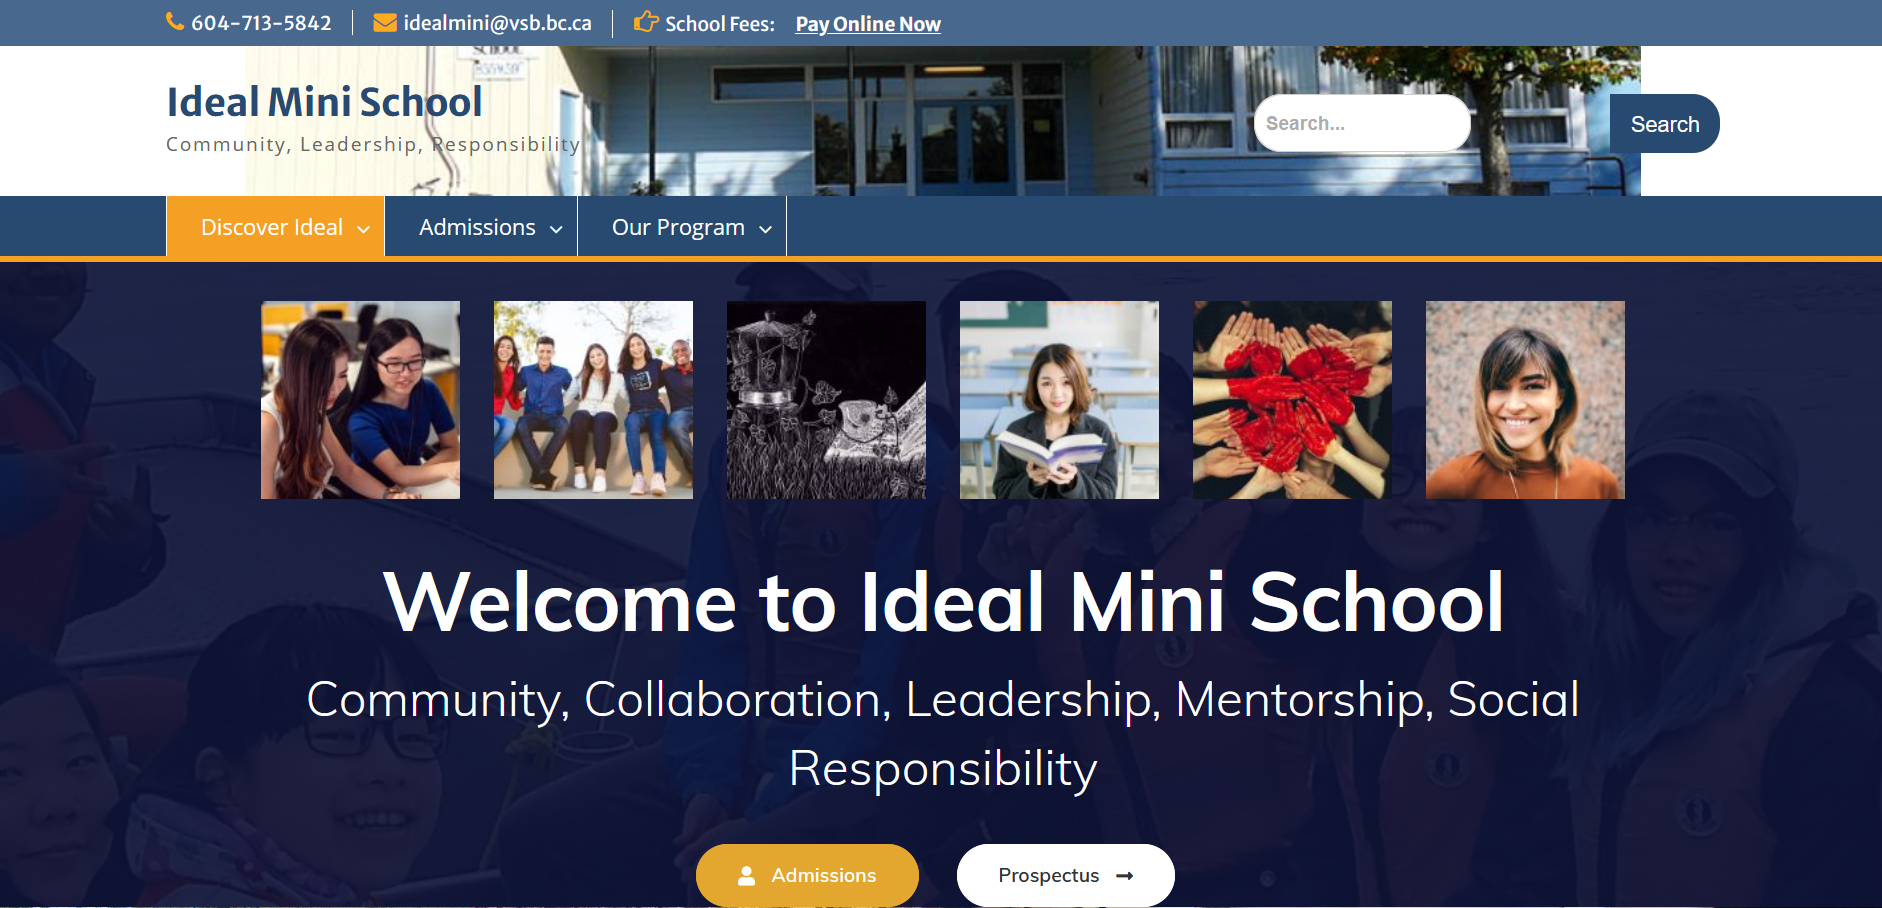 Ideal Mini website